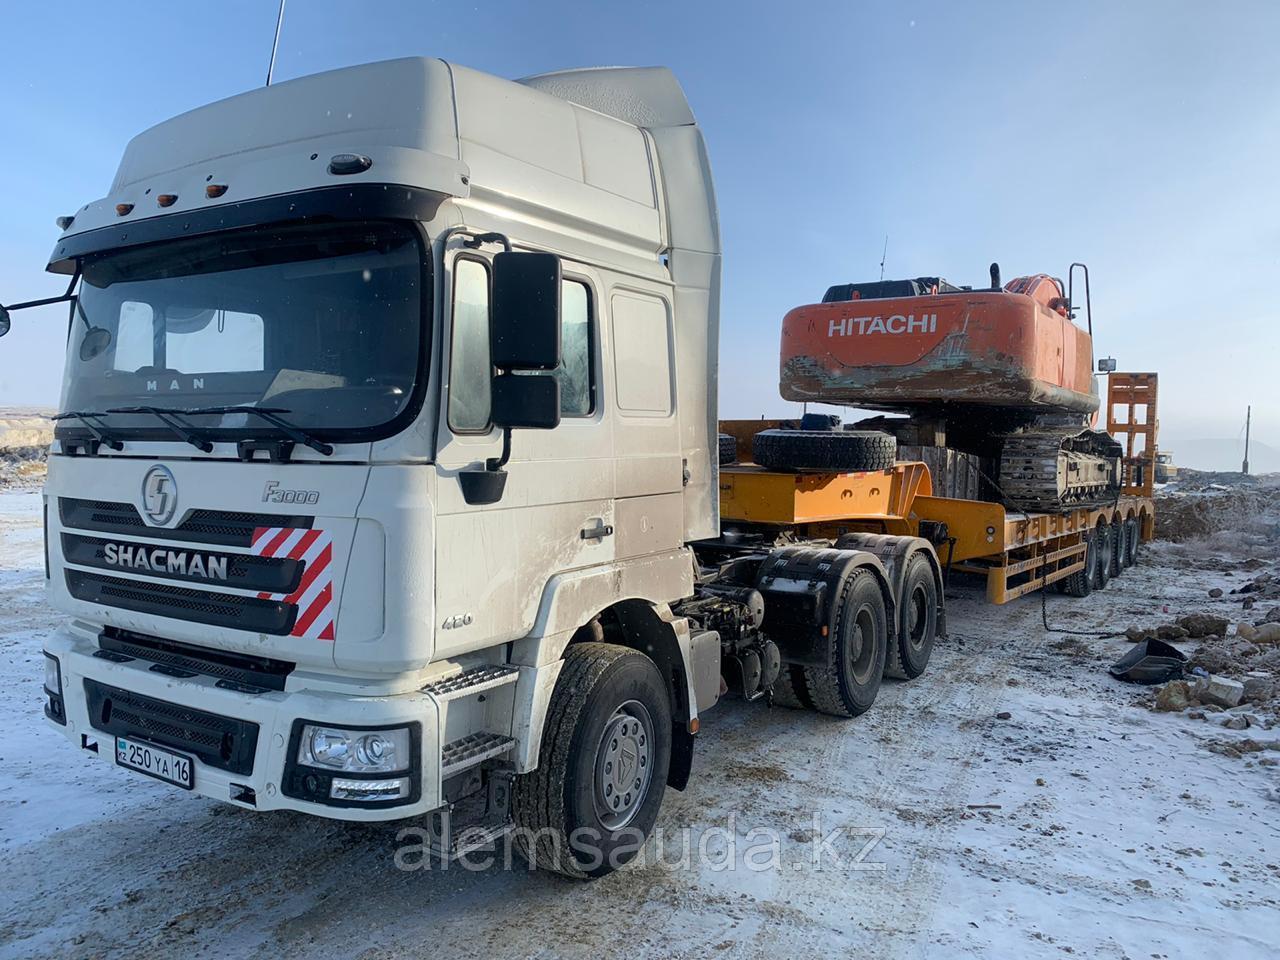 Услуги трала 60 тонн. Перевозка спецтехники по Казахстану